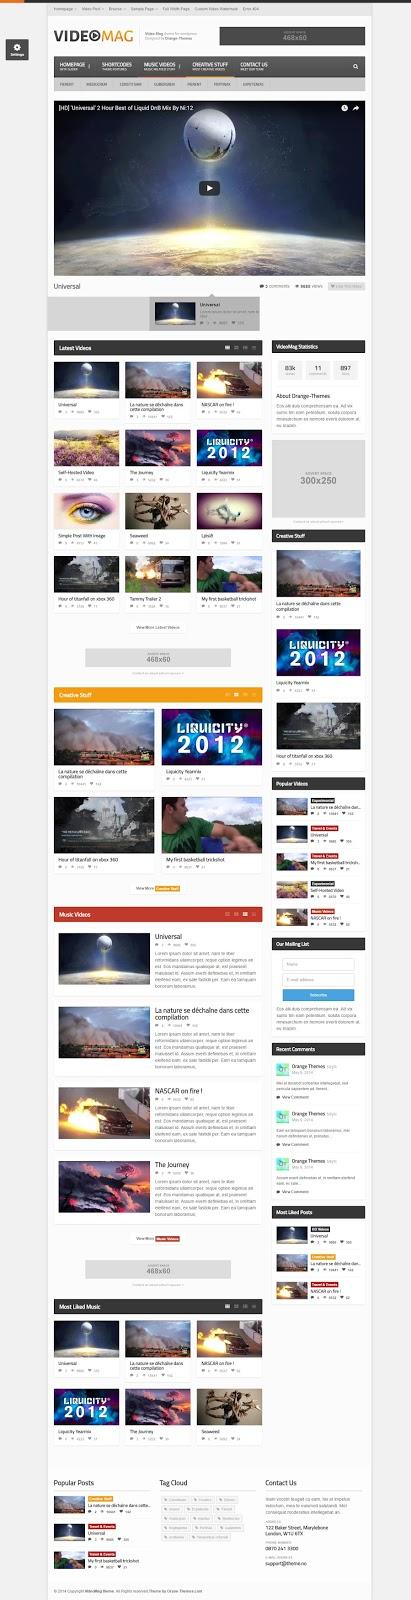 VideoMag-Premium WordPress theme for playing videos